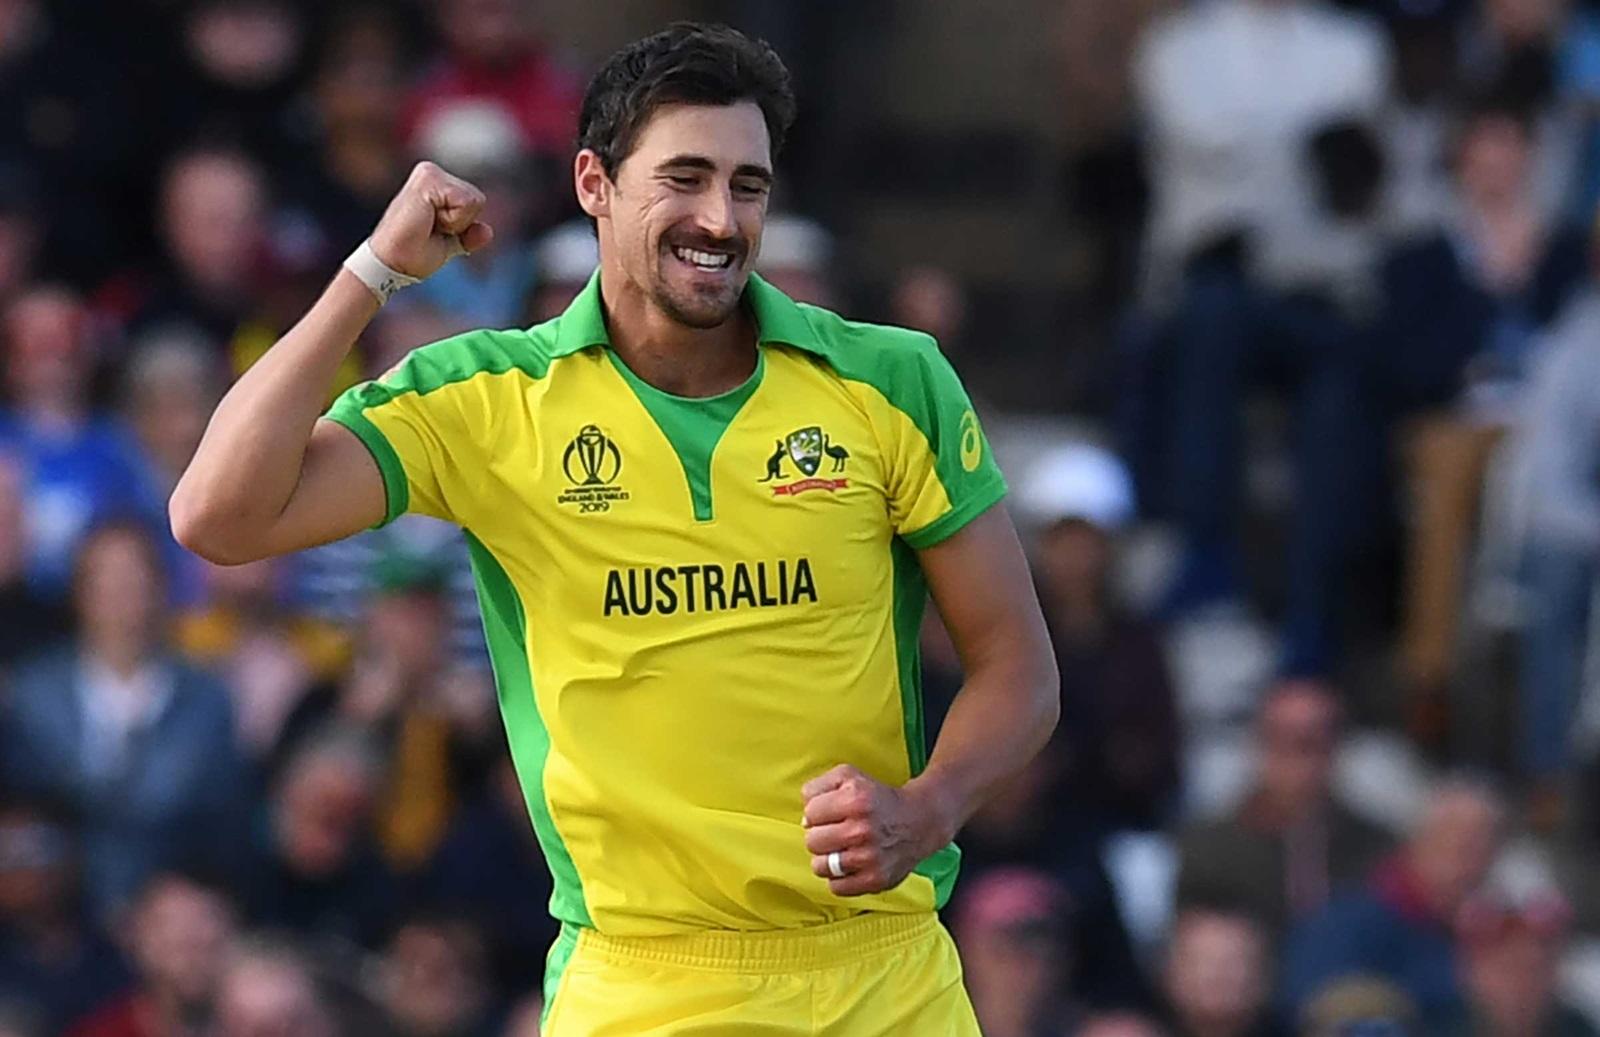 Starc hits rewind to find World Cup form | cricket.com.au